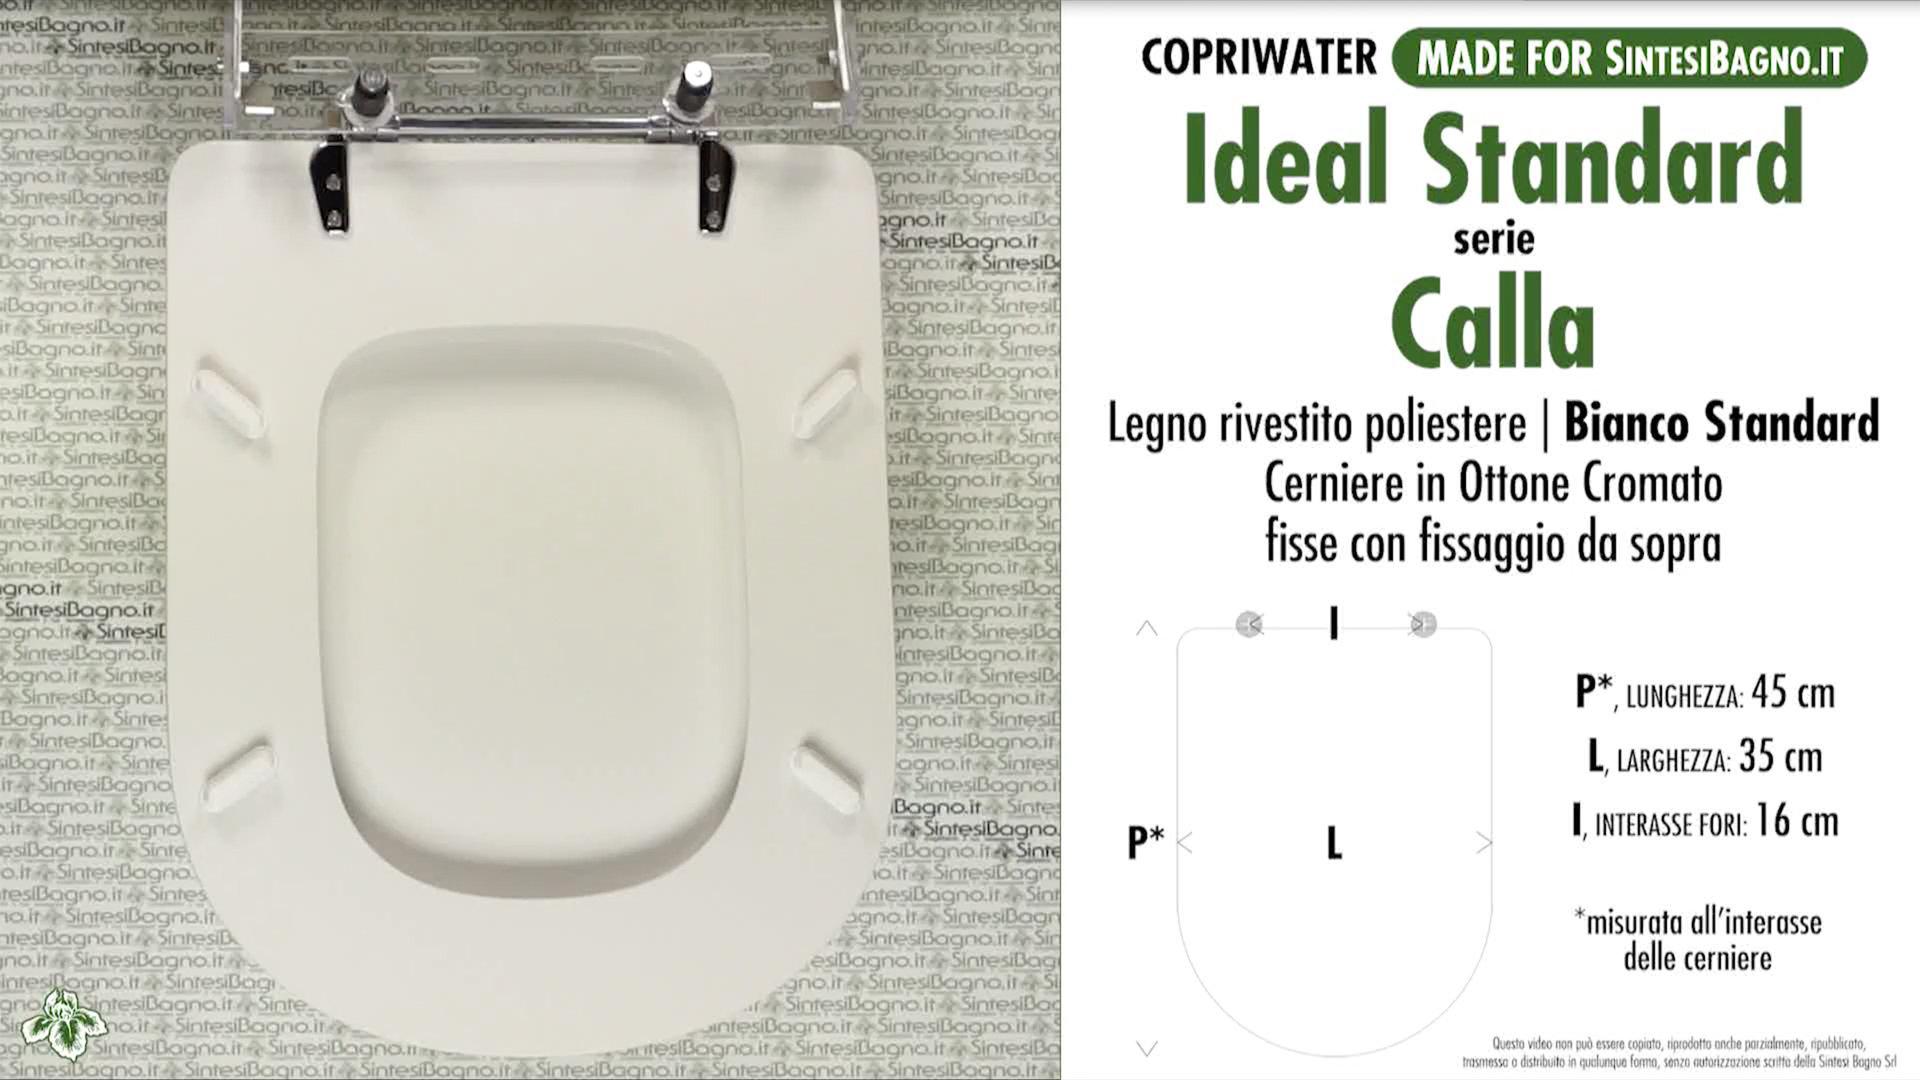 Copriwater per wc calla ideal standard bianco standard for Ideal standard cantica copriwater